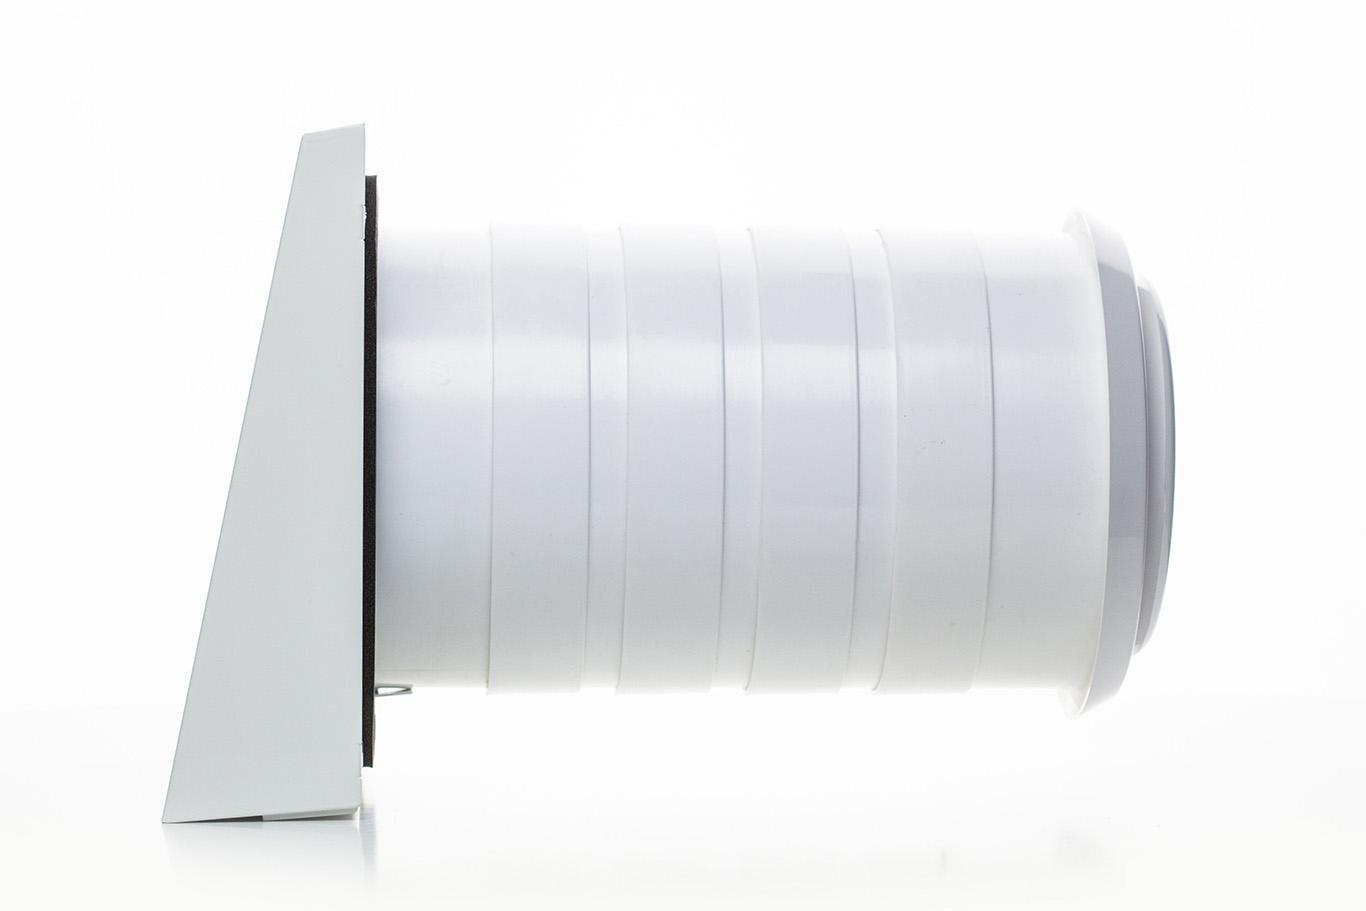 Ventoxx Comfort rekuperators ar impulsa vadība keramiskais siltuma akumulators